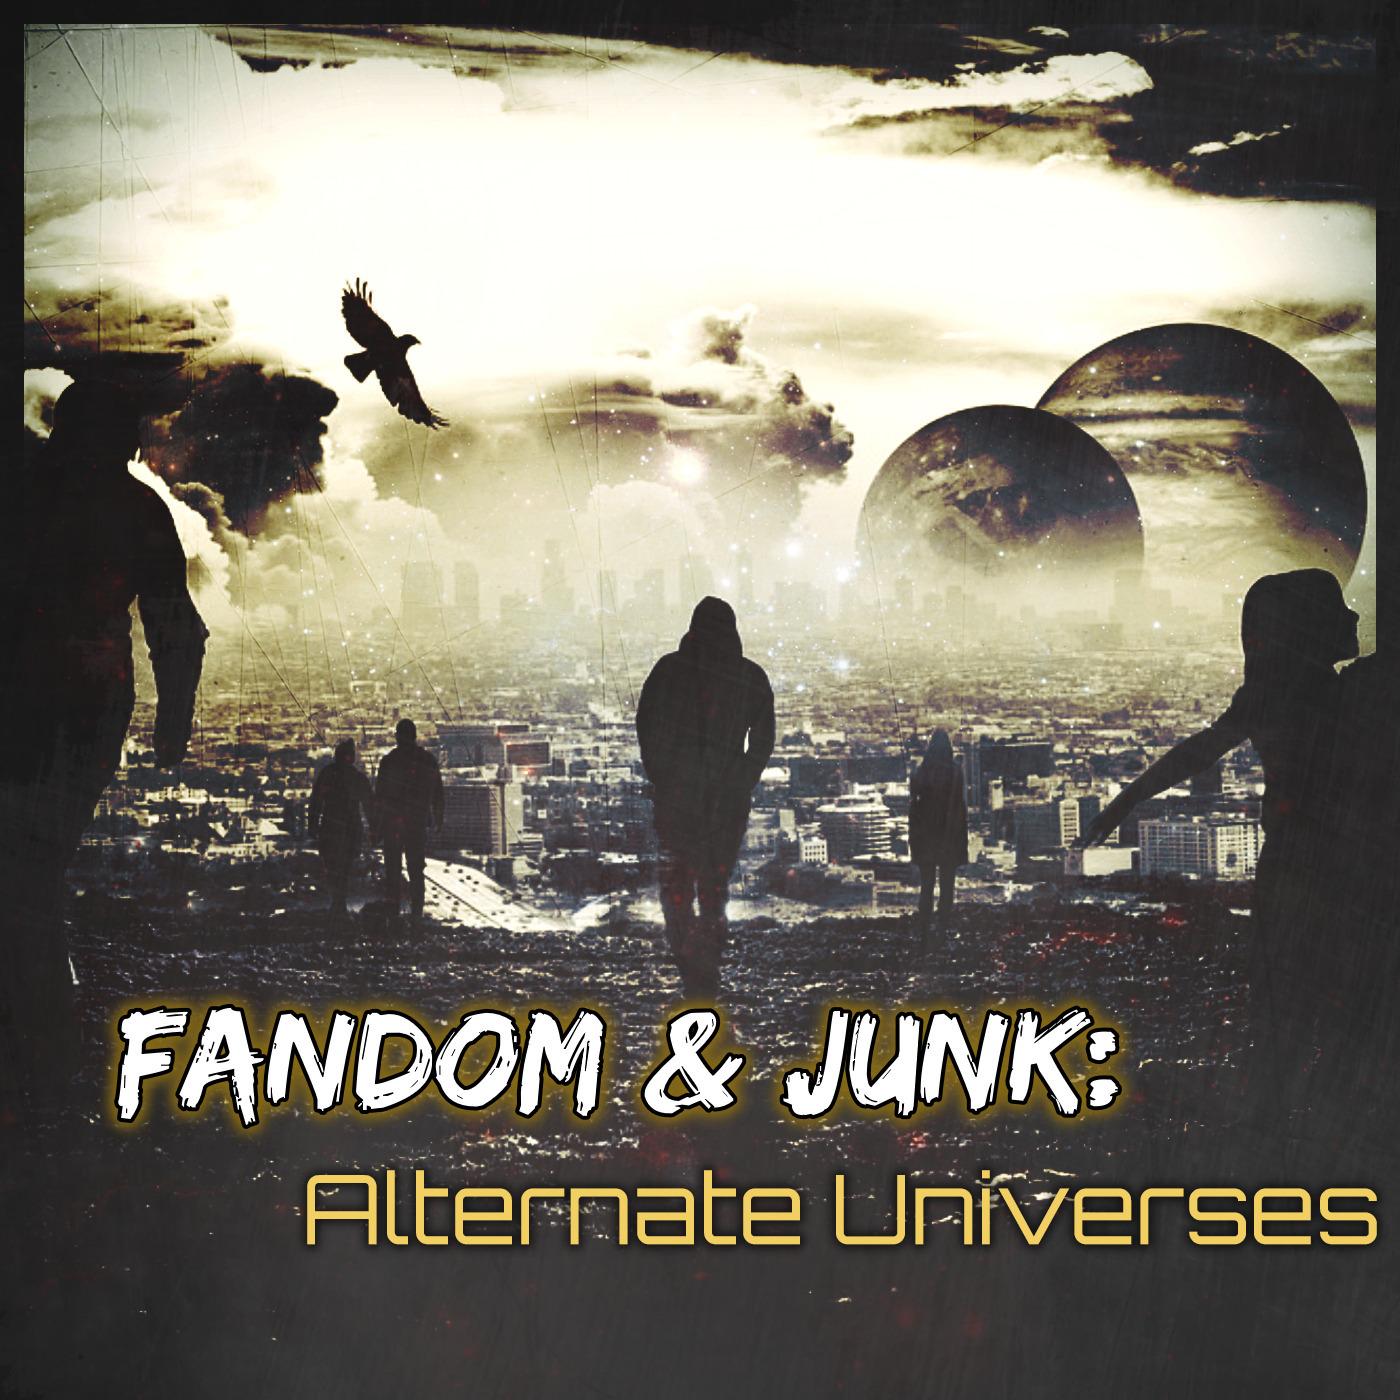 Fandom & Junk: Alternate Universes